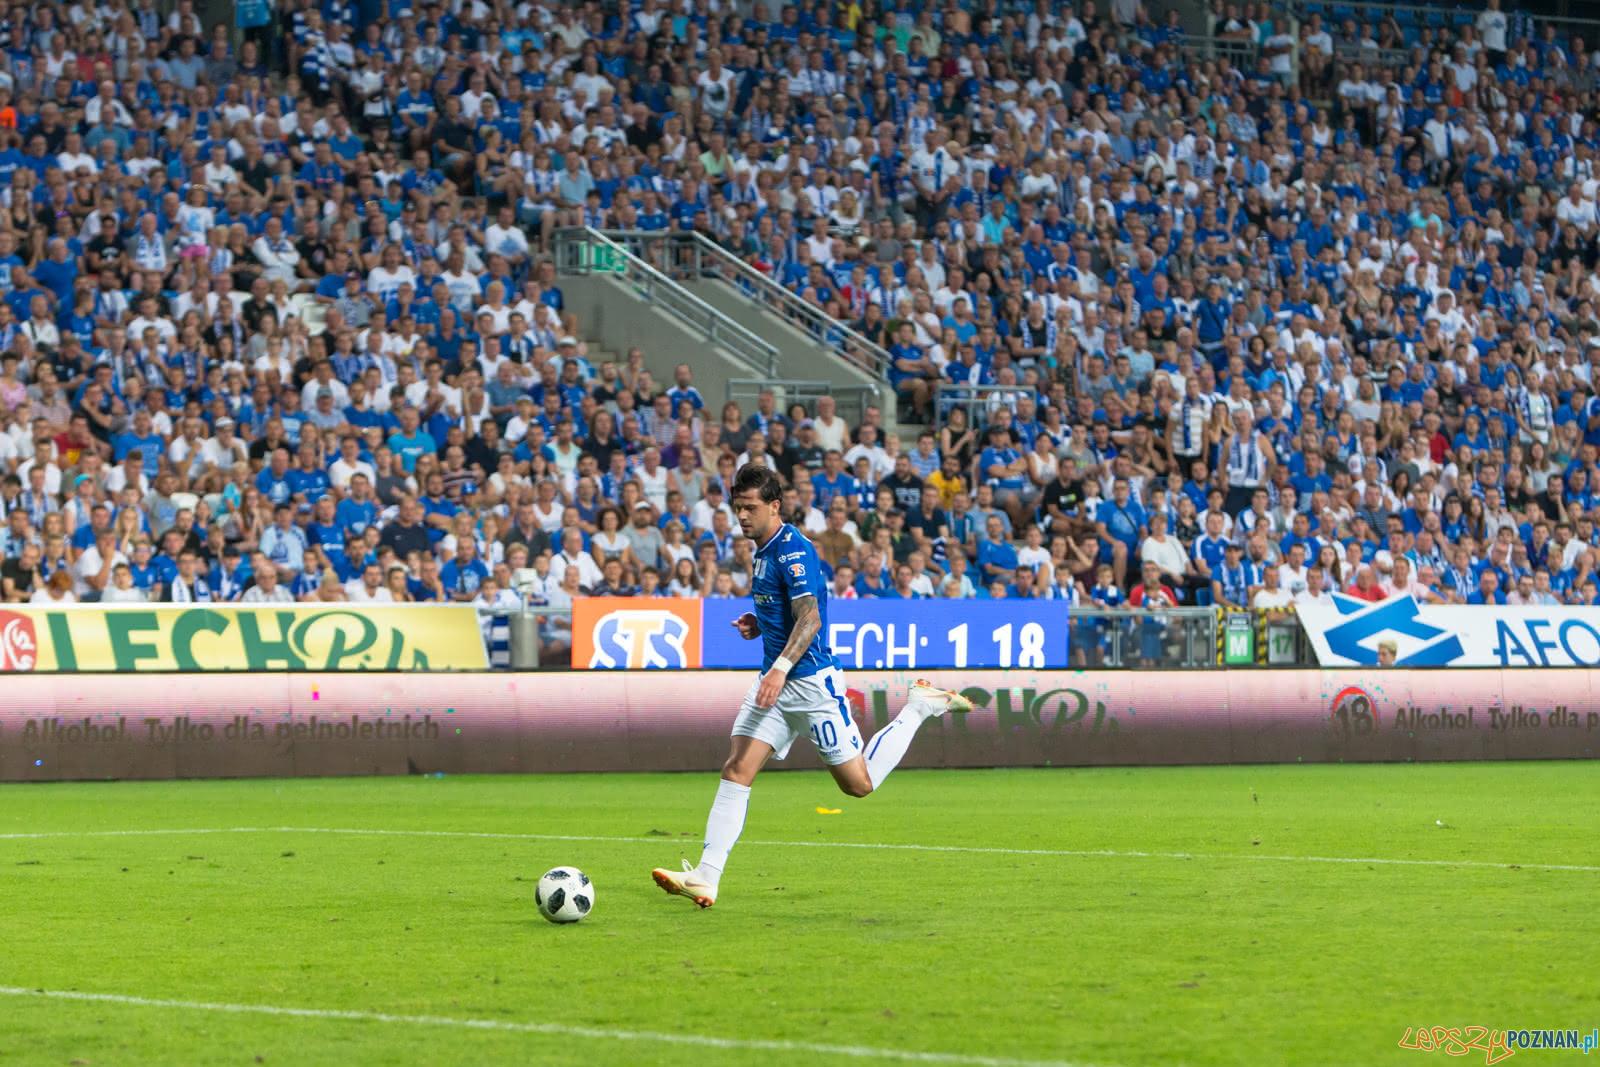 Lech Poznań - FC Shakhtyor Soligorsk (Darko jevtic)  Foto: lepszyPOZNAN.pl/Piotr Rychter